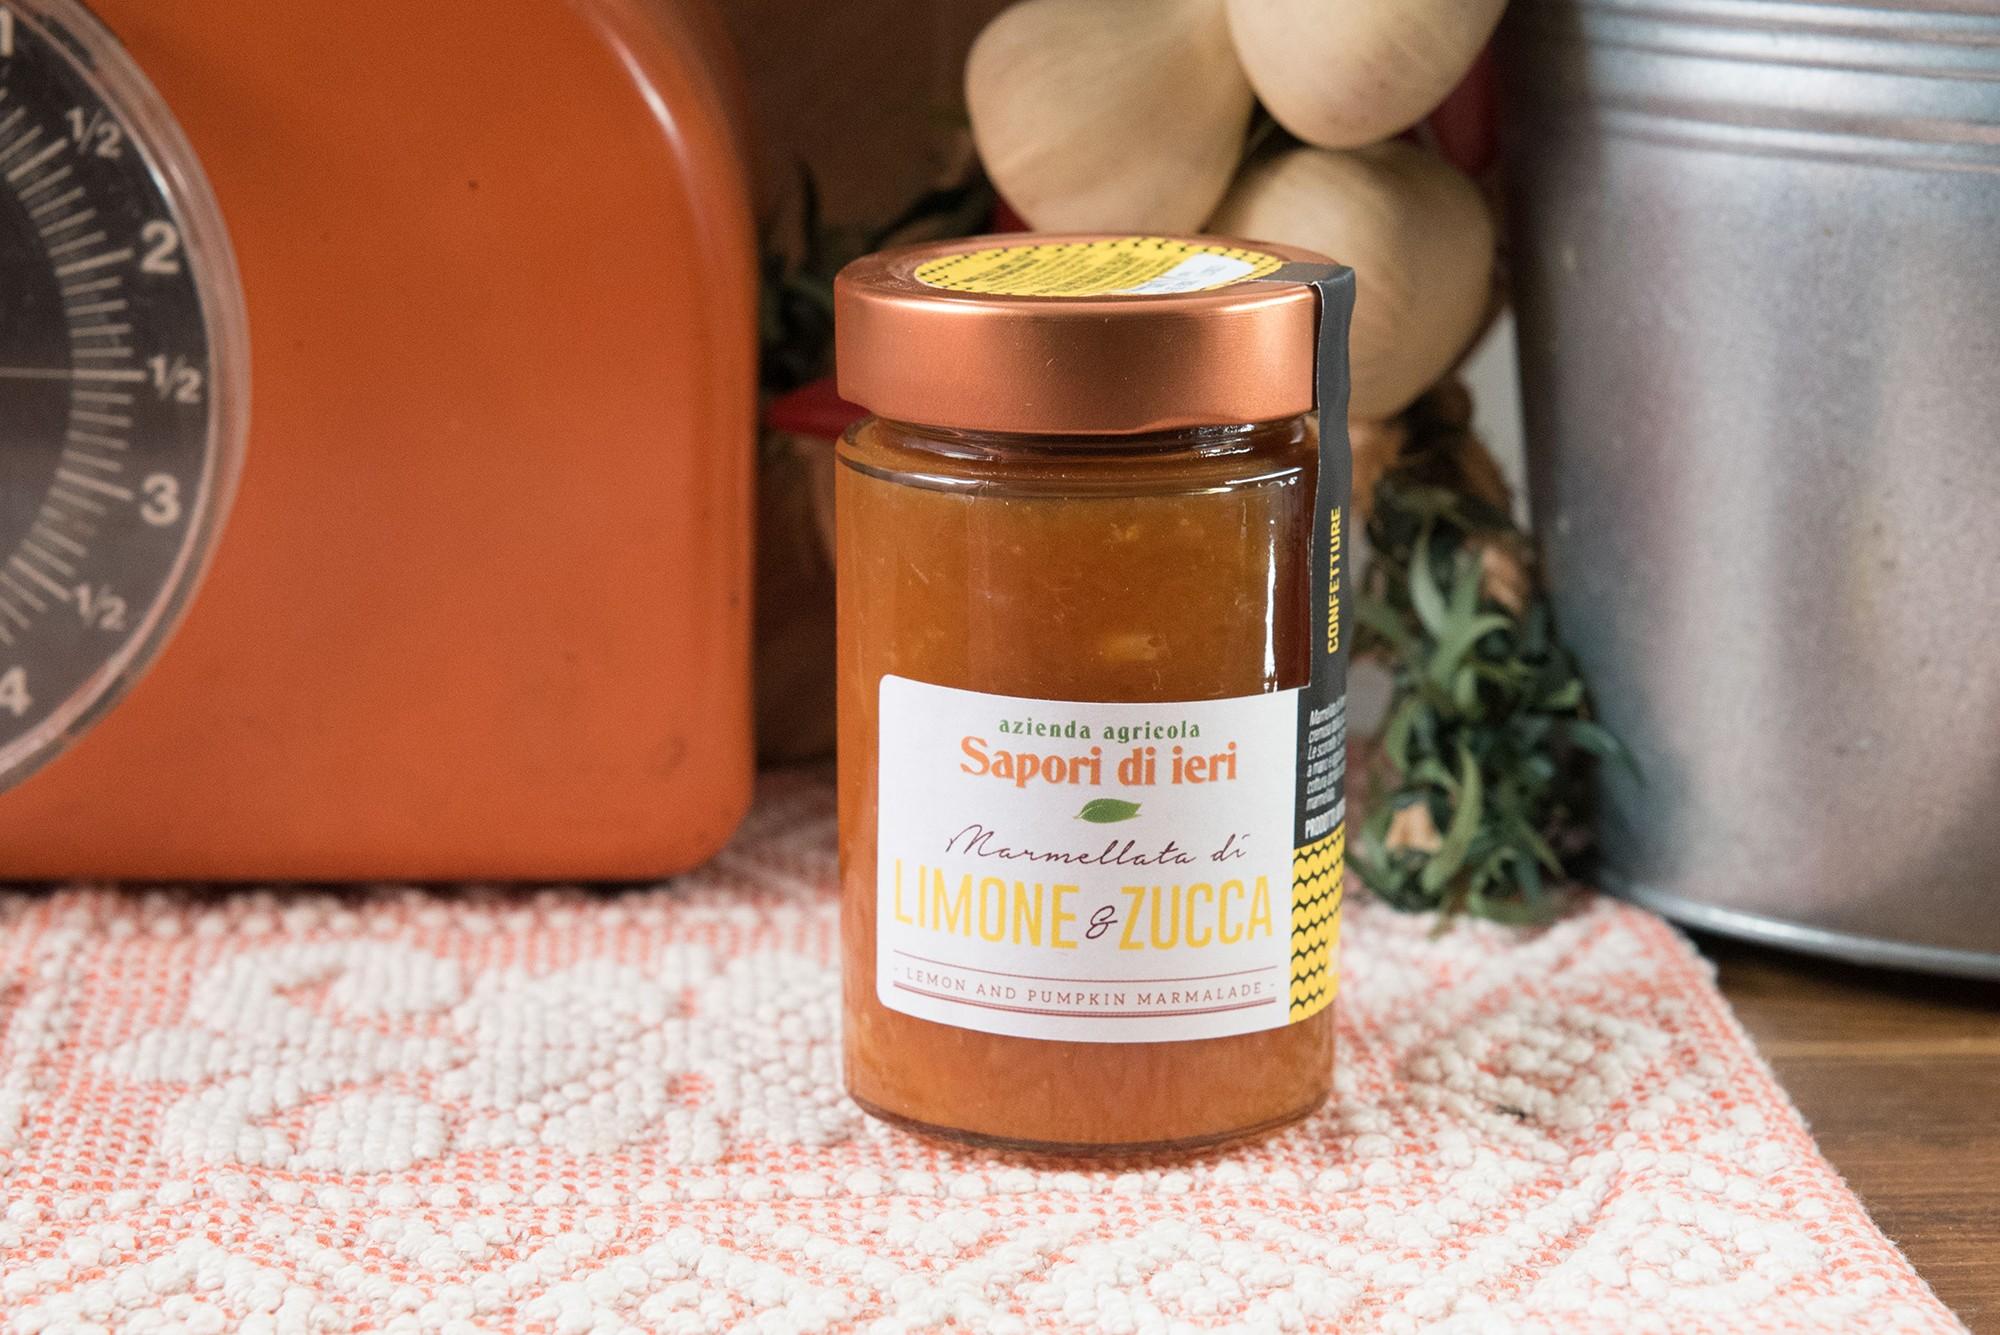 Marmellata Limone e Zucca 210 g - Sapori di Ieri